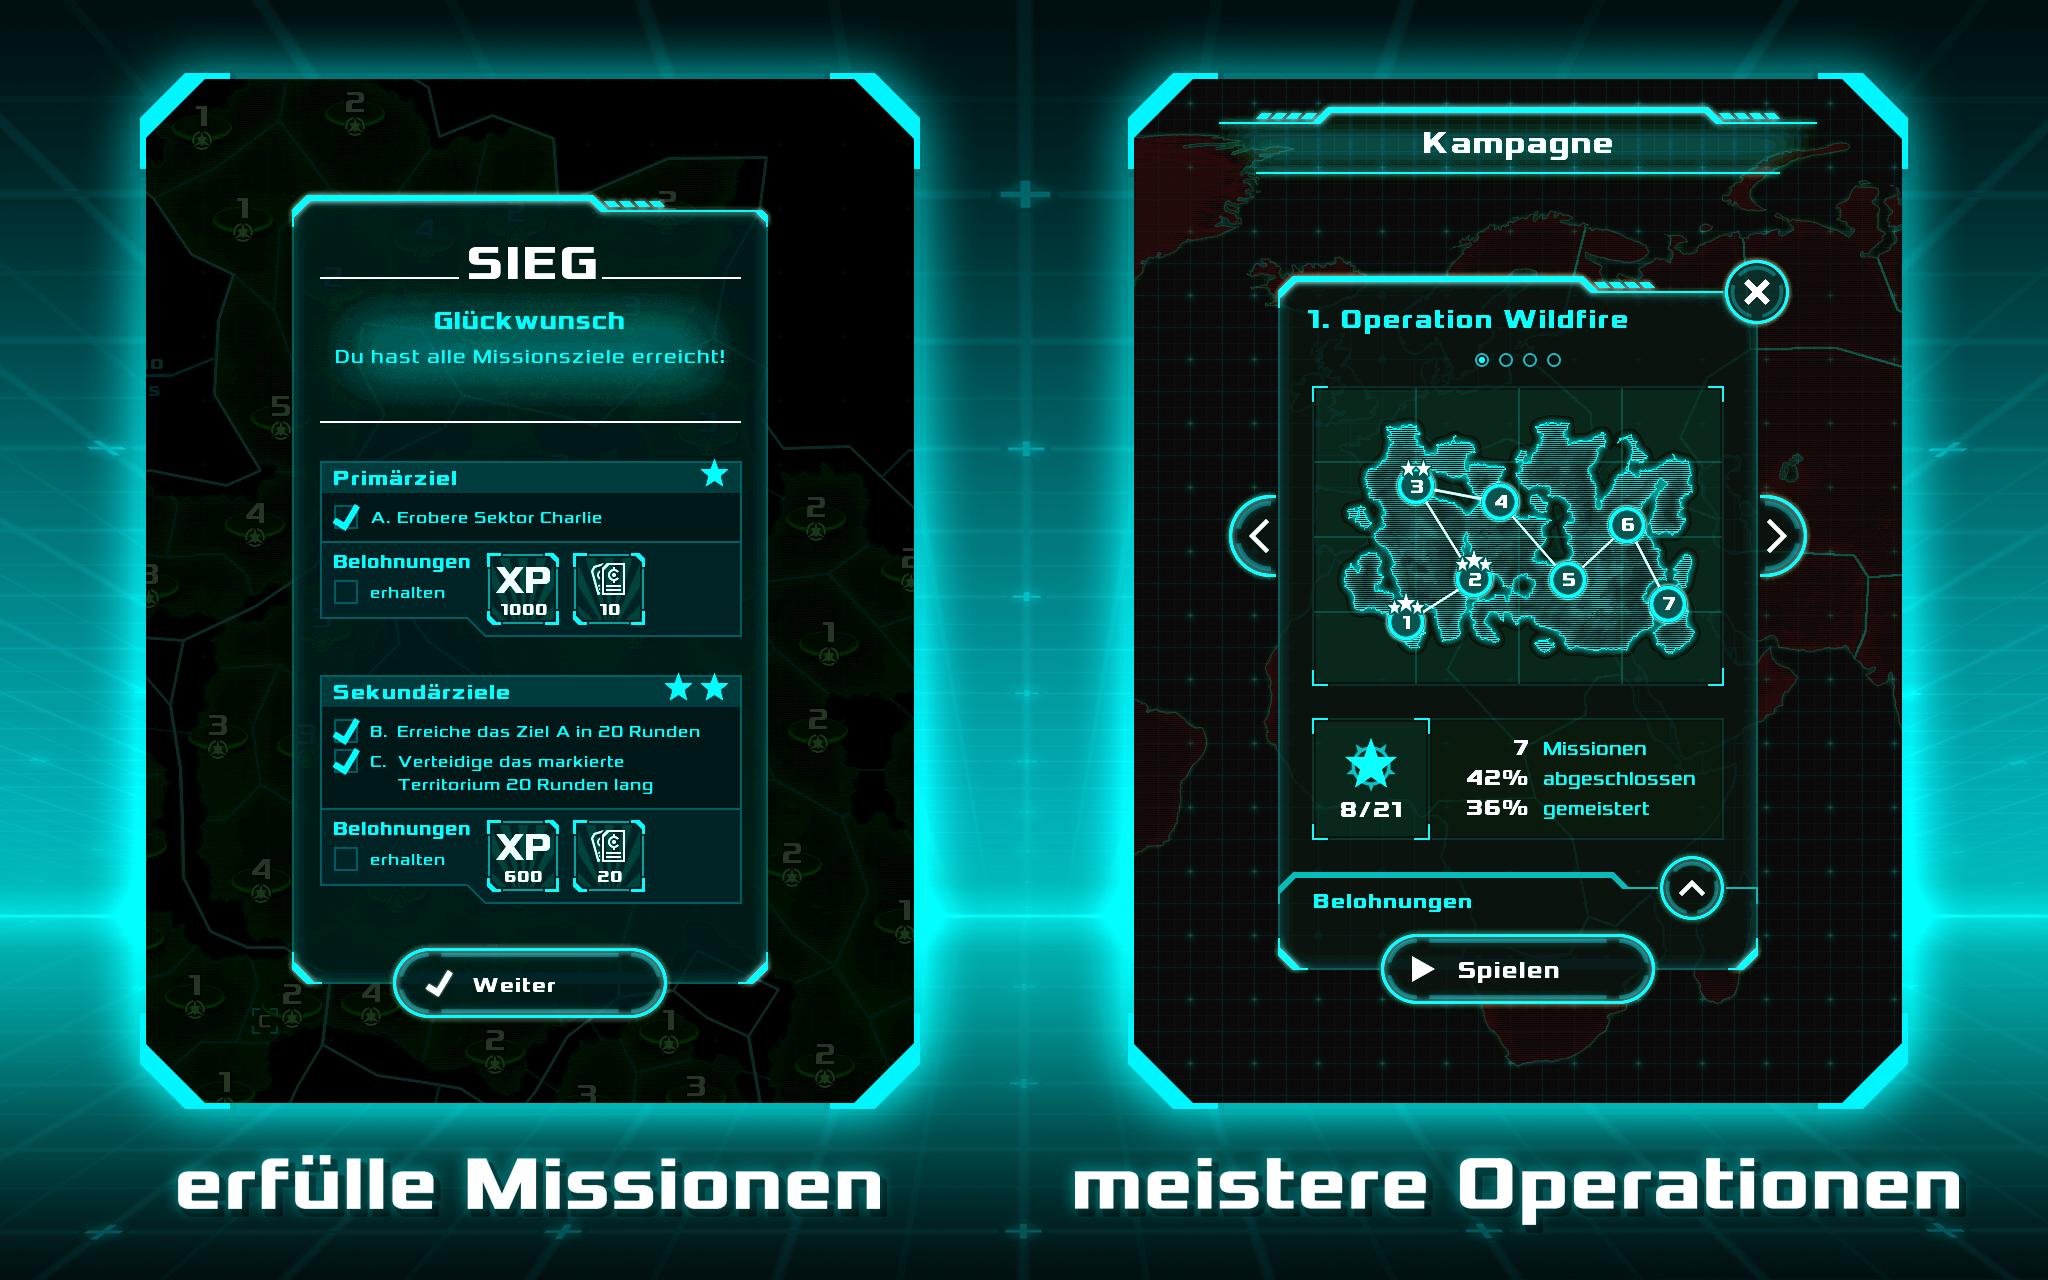 Reihenfolge Der Operations-Spiele - Nicprefbang5